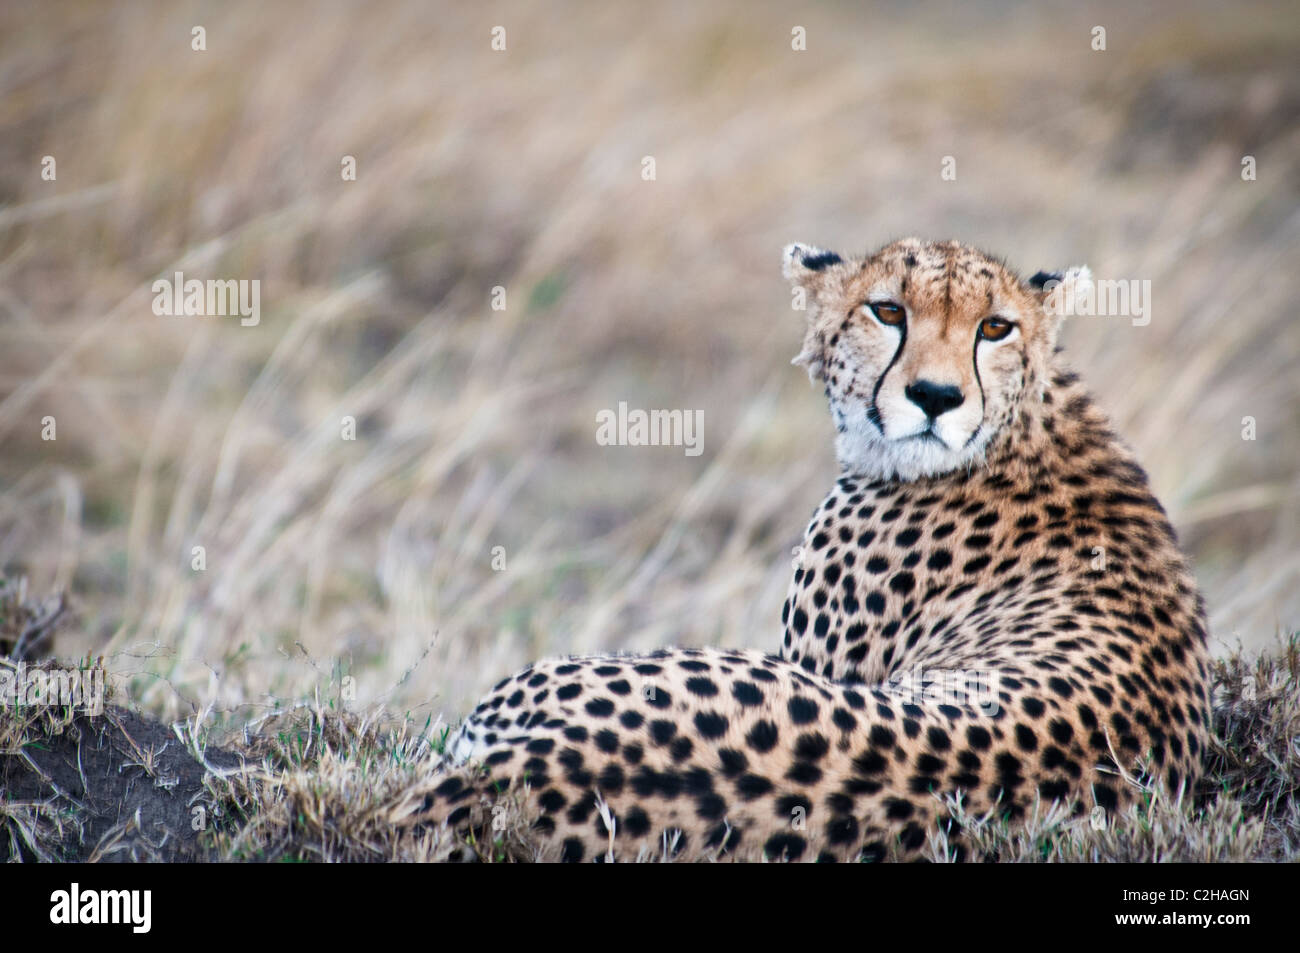 Cheetah, Acinonyx jubatus, in cerca di preda, il Masai Mara riserva nazionale, Kenya, Africa Foto Stock